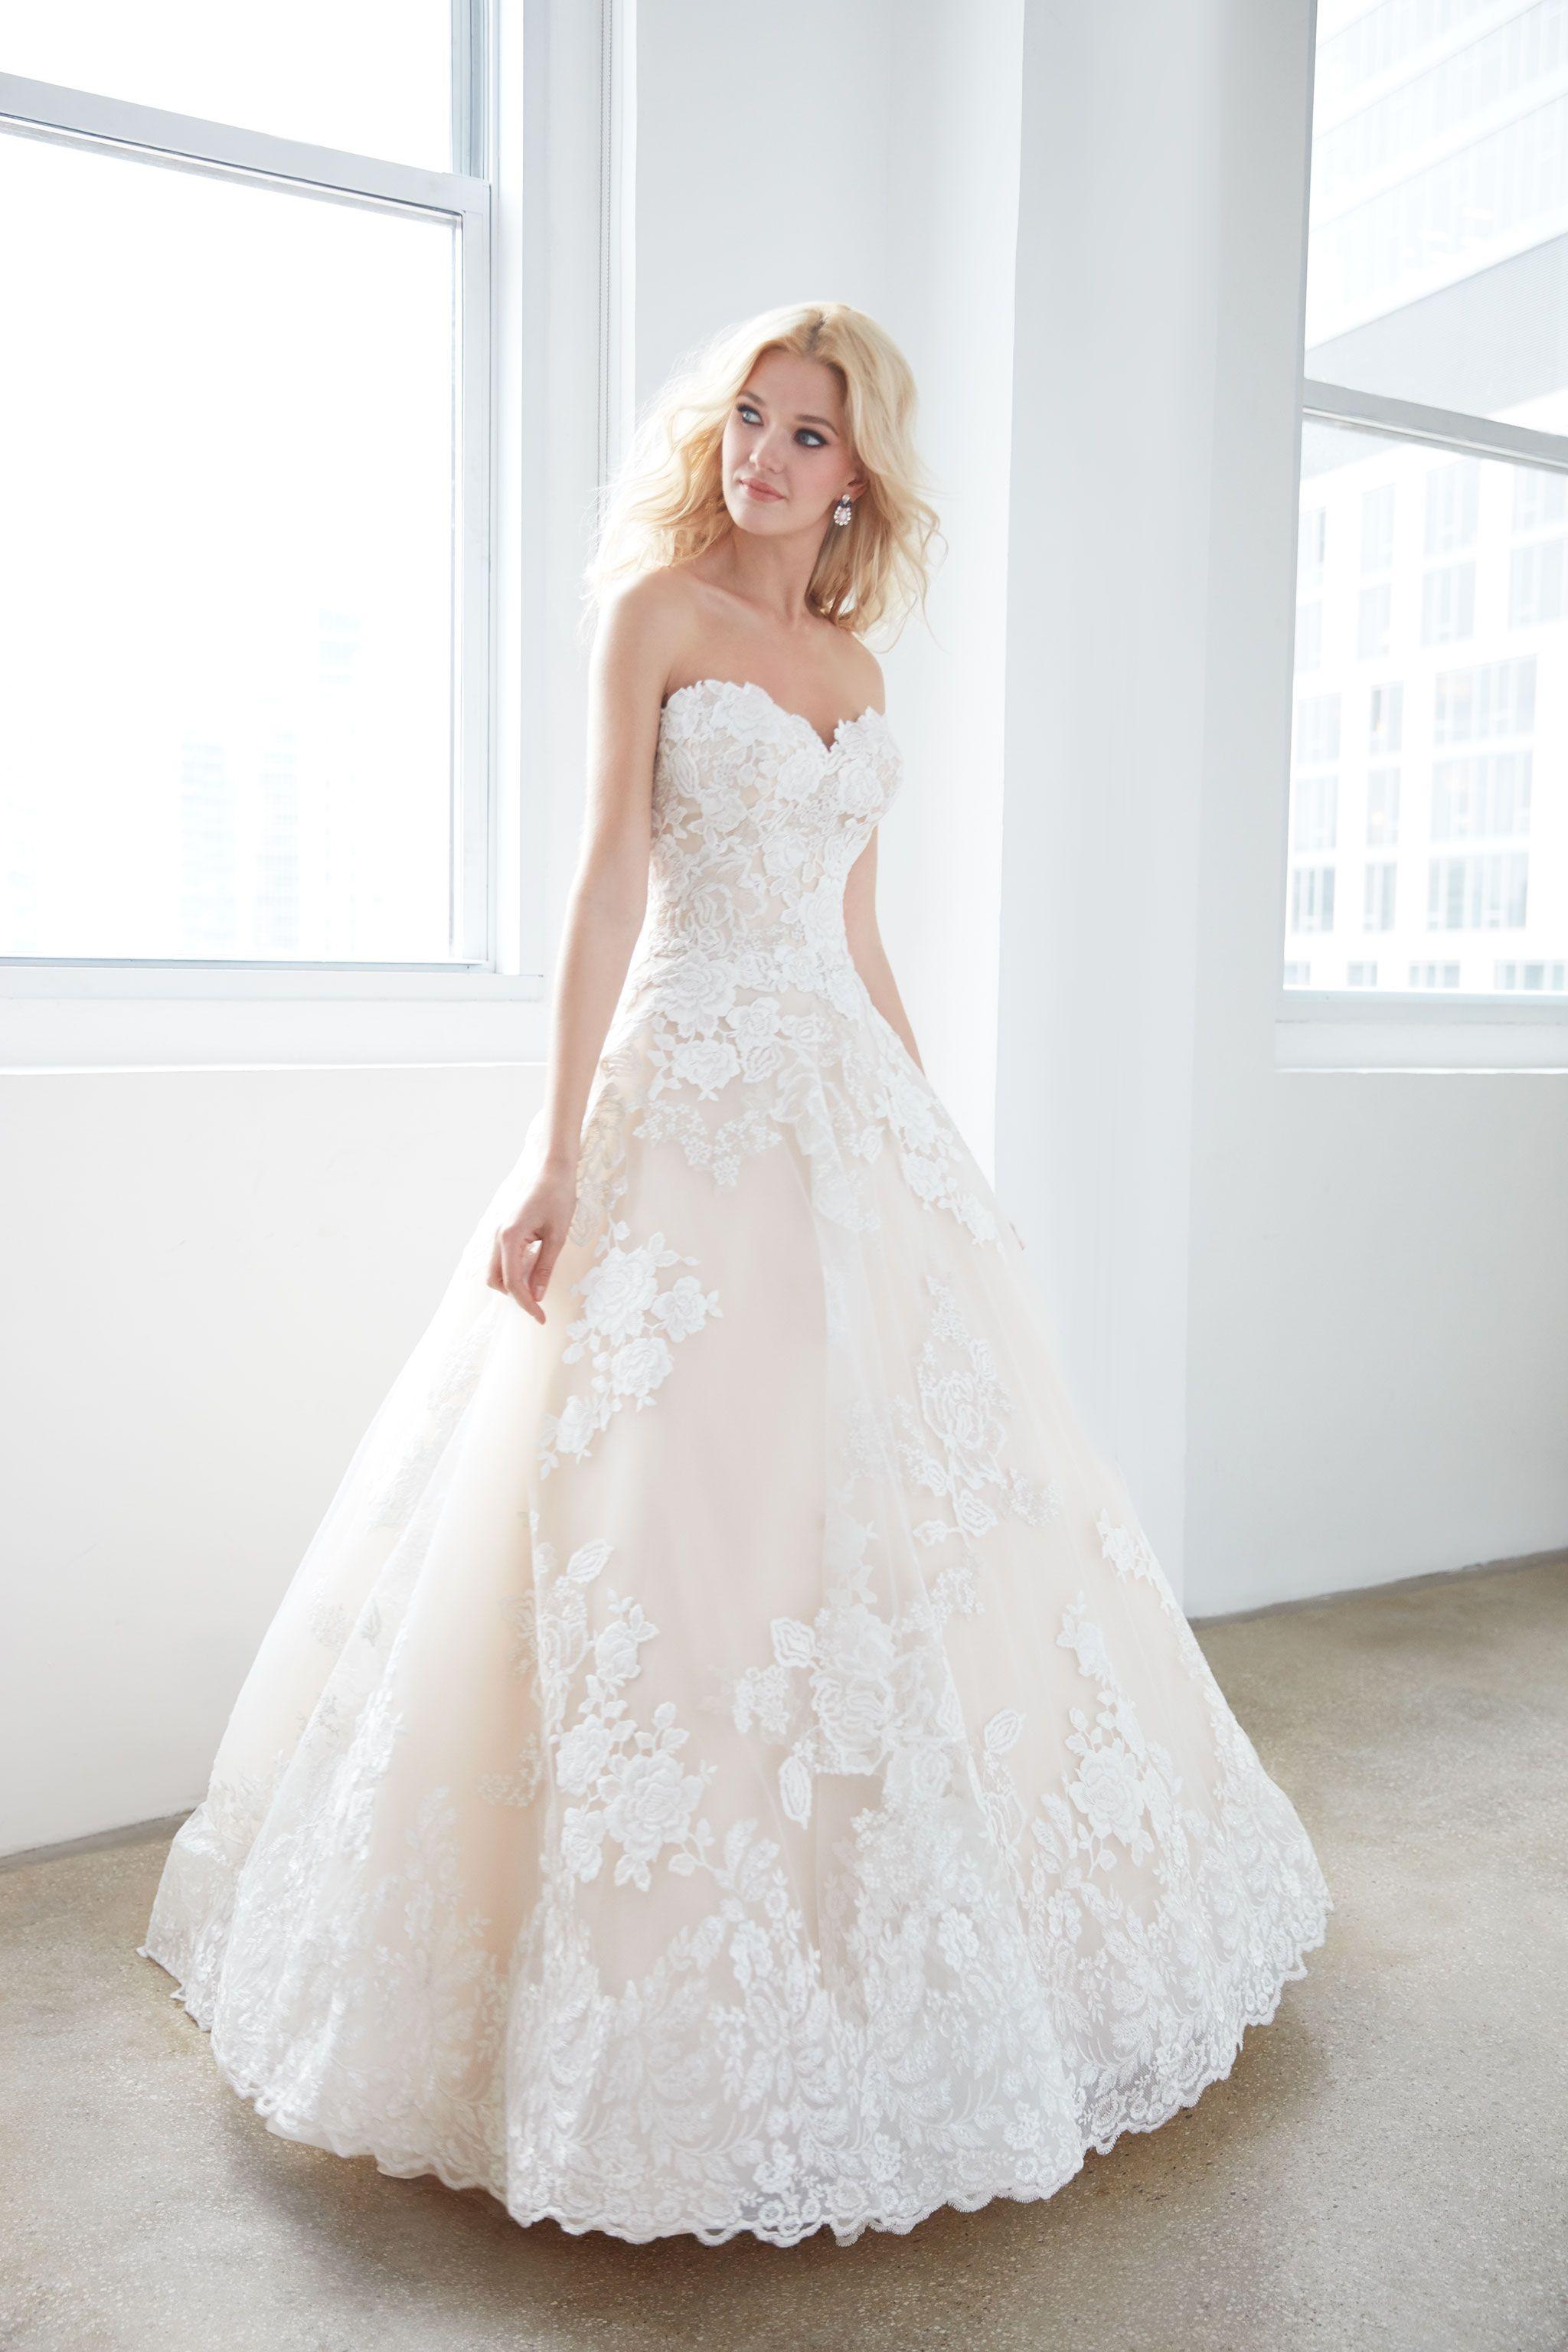 Thumbnail wedding dresses pinterest wedding wedding dress and